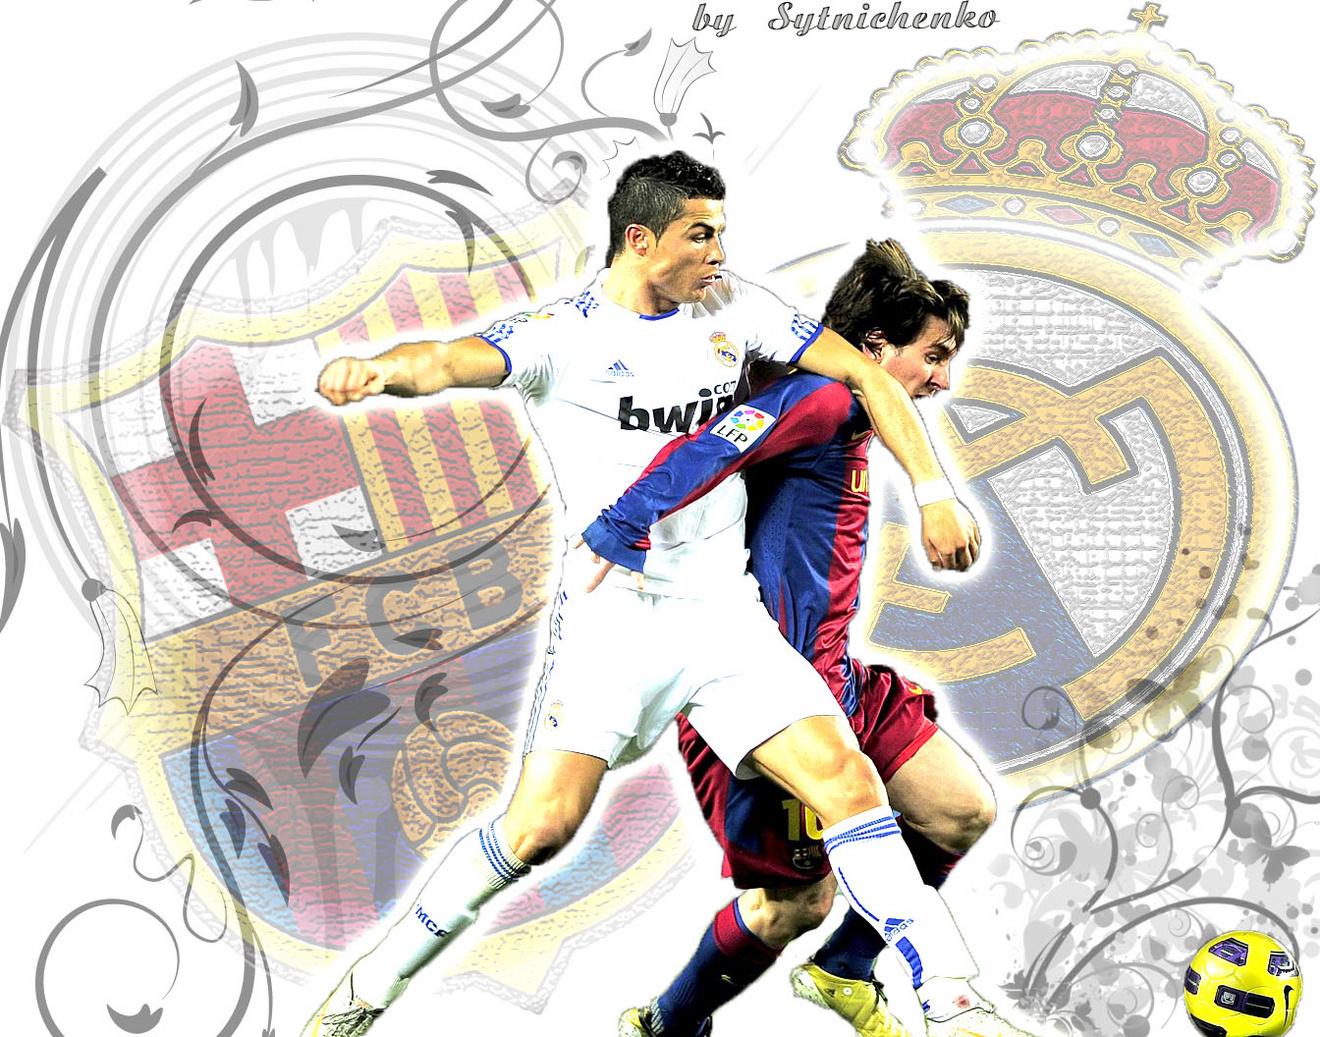 http://3.bp.blogspot.com/-cc_c81GkqJk/TfIjyaboMVI/AAAAAAAABMU/plrjgp5uLo0/s1600/cr7_vs_messi_cristiano_ronaldo_fc_barcelona_real_madrid.jpg